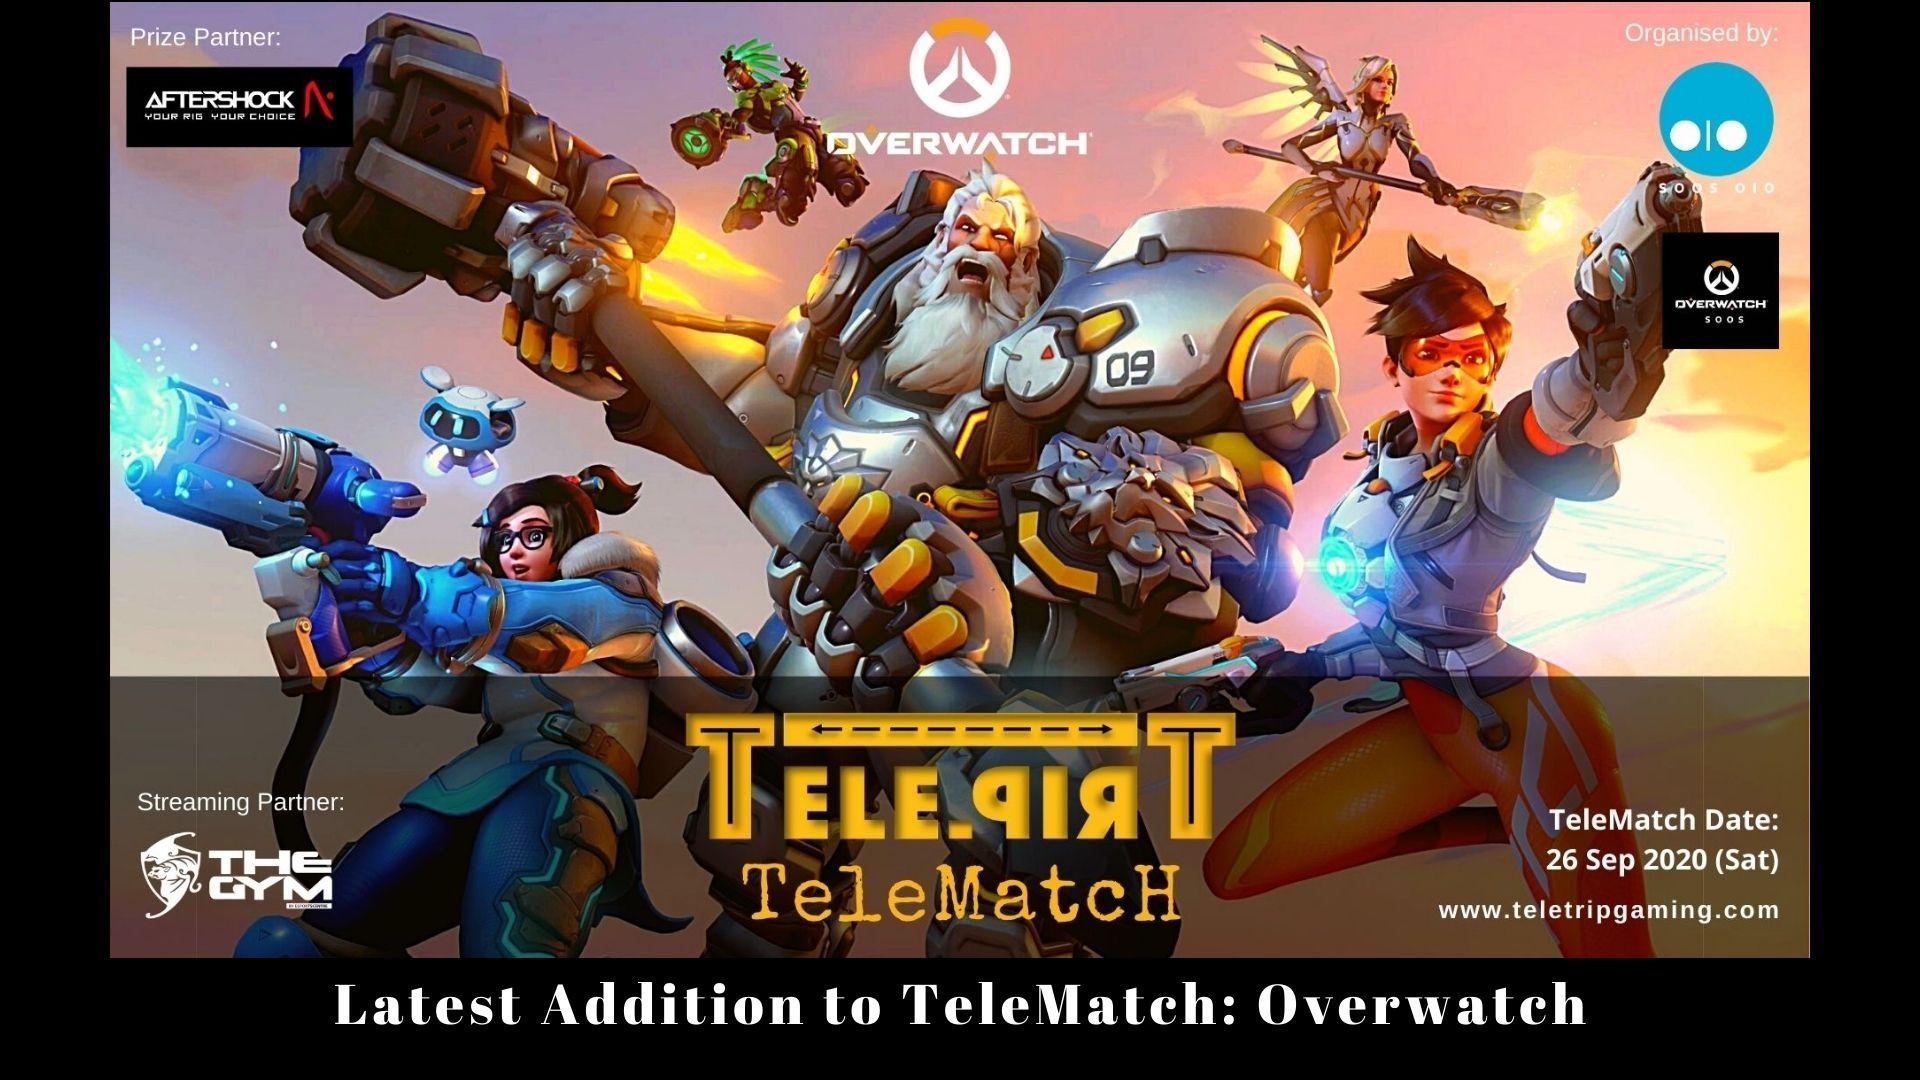 Latest Addition to TeleMatch Overwatch